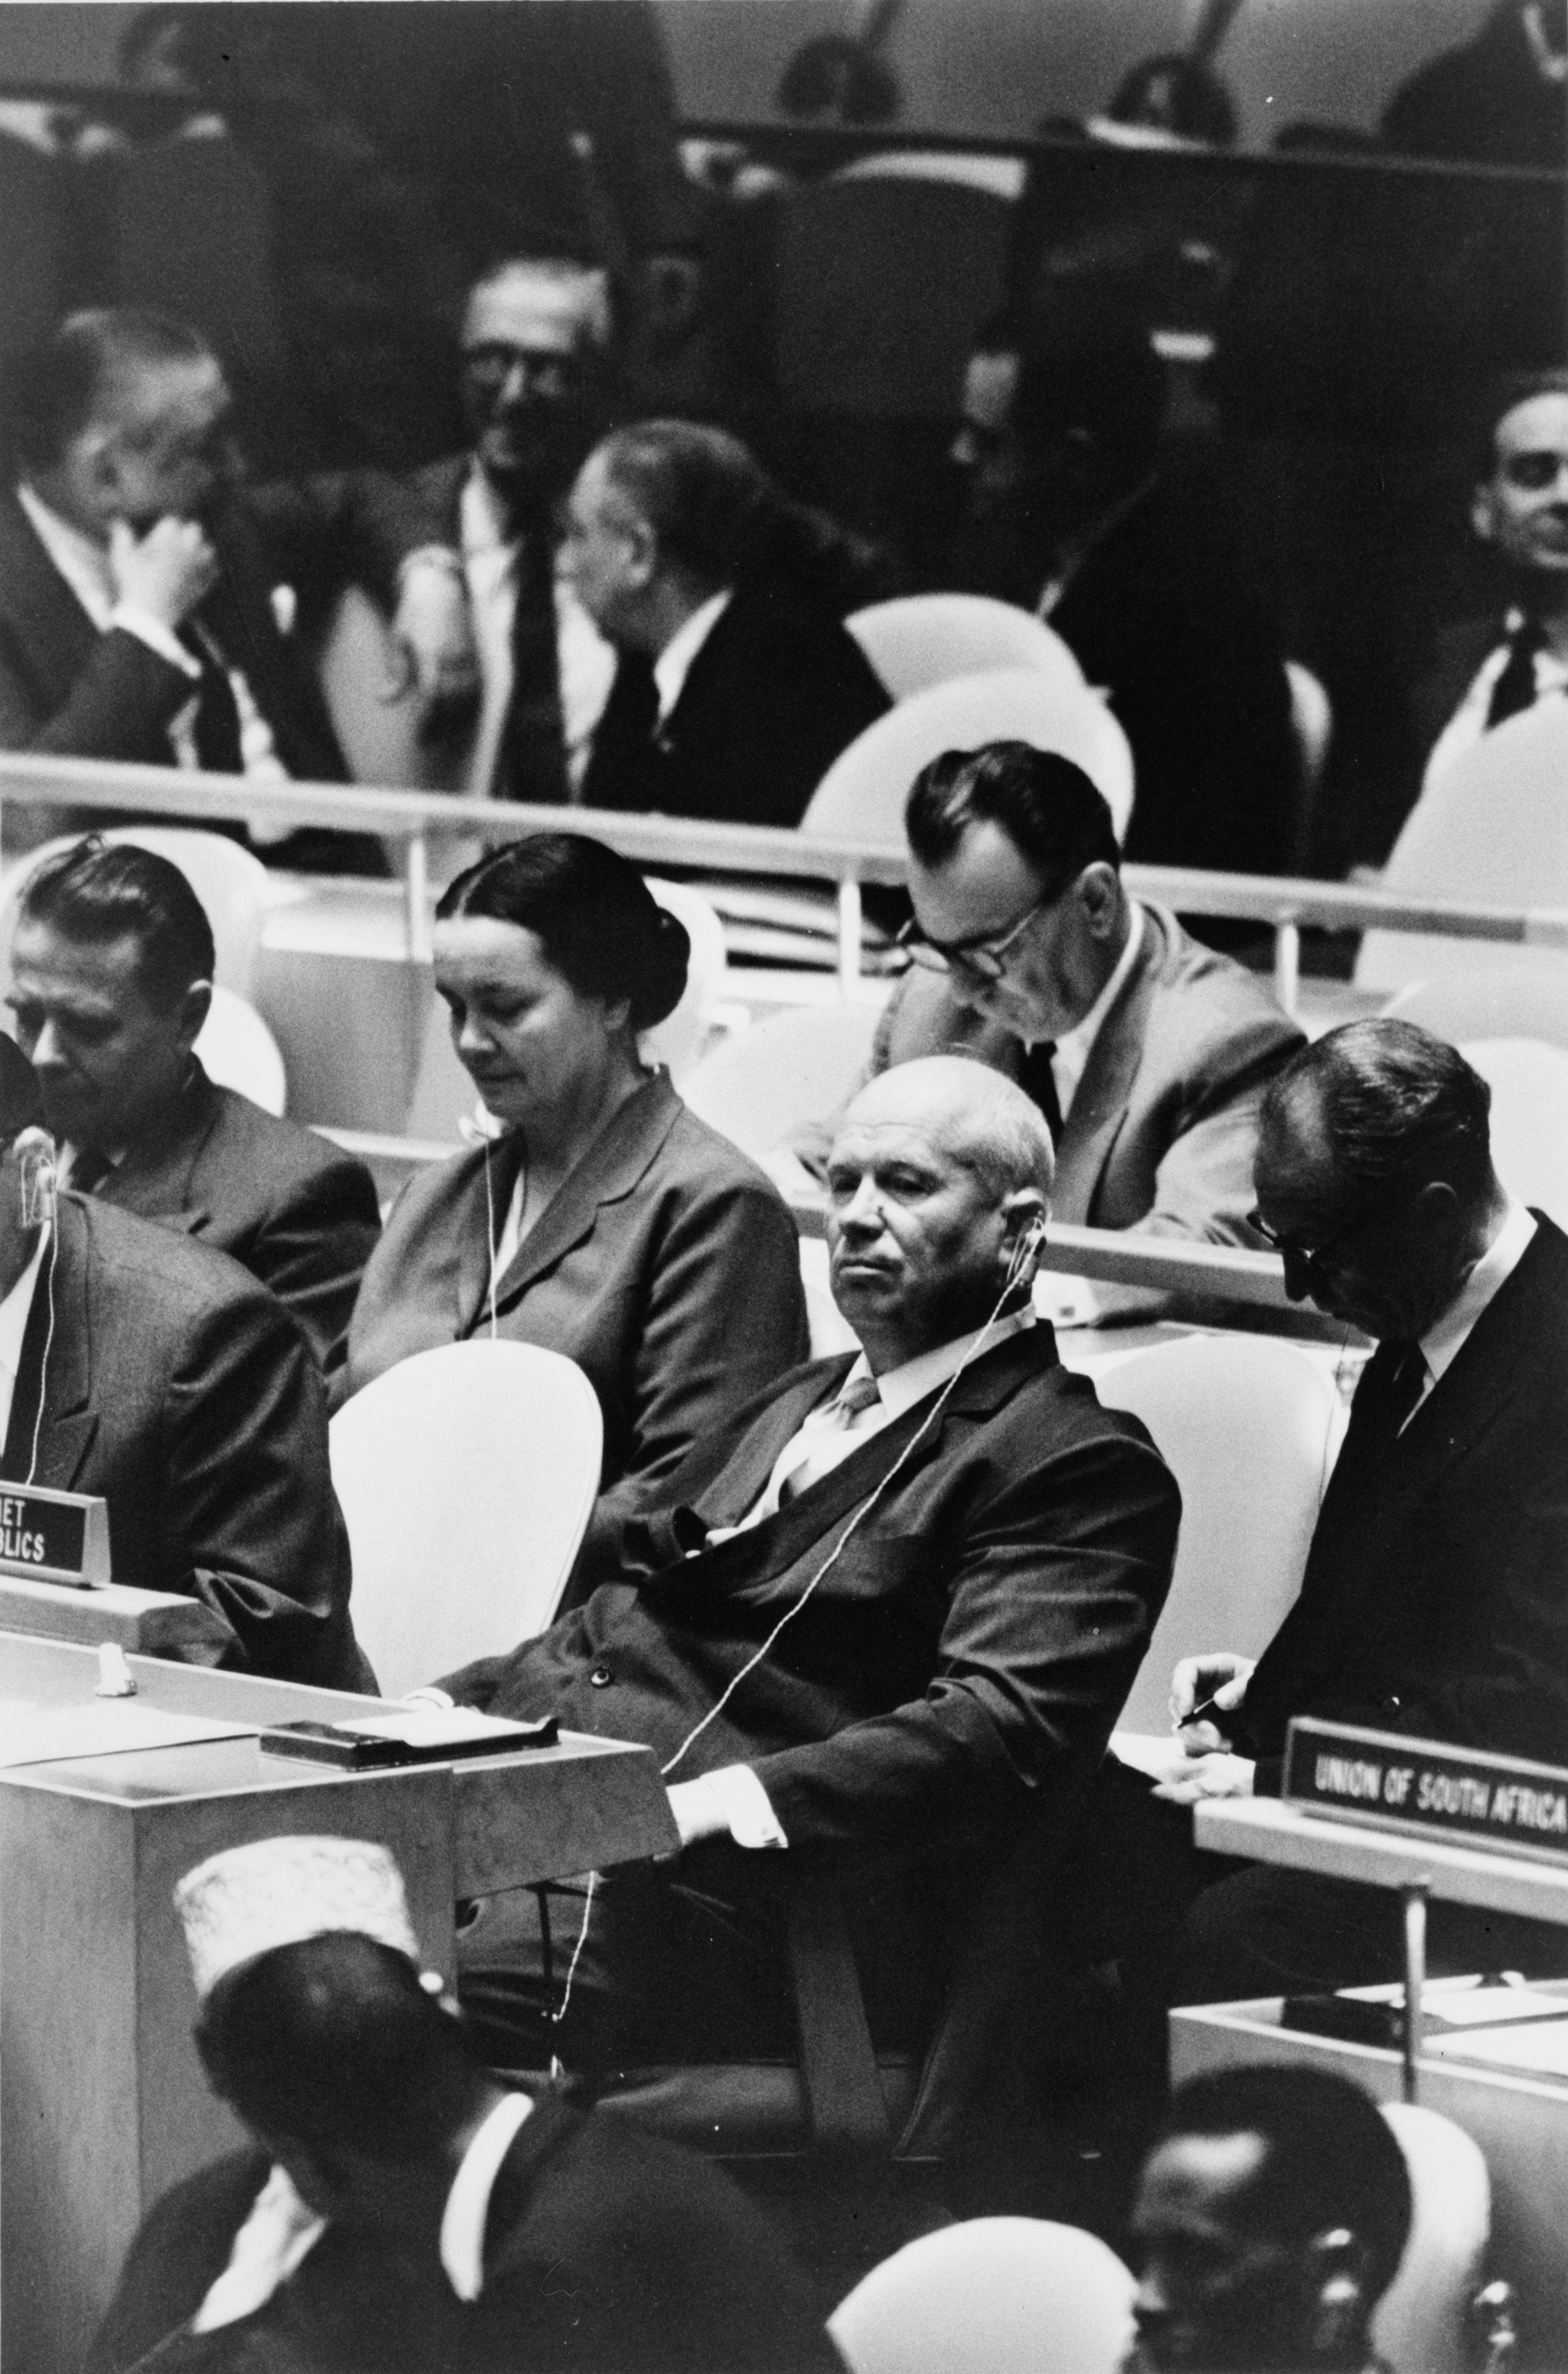 https://upload.wikimedia.org/wikipedia/commons/5/57/Nikita_Khrushchev_1960.jpg